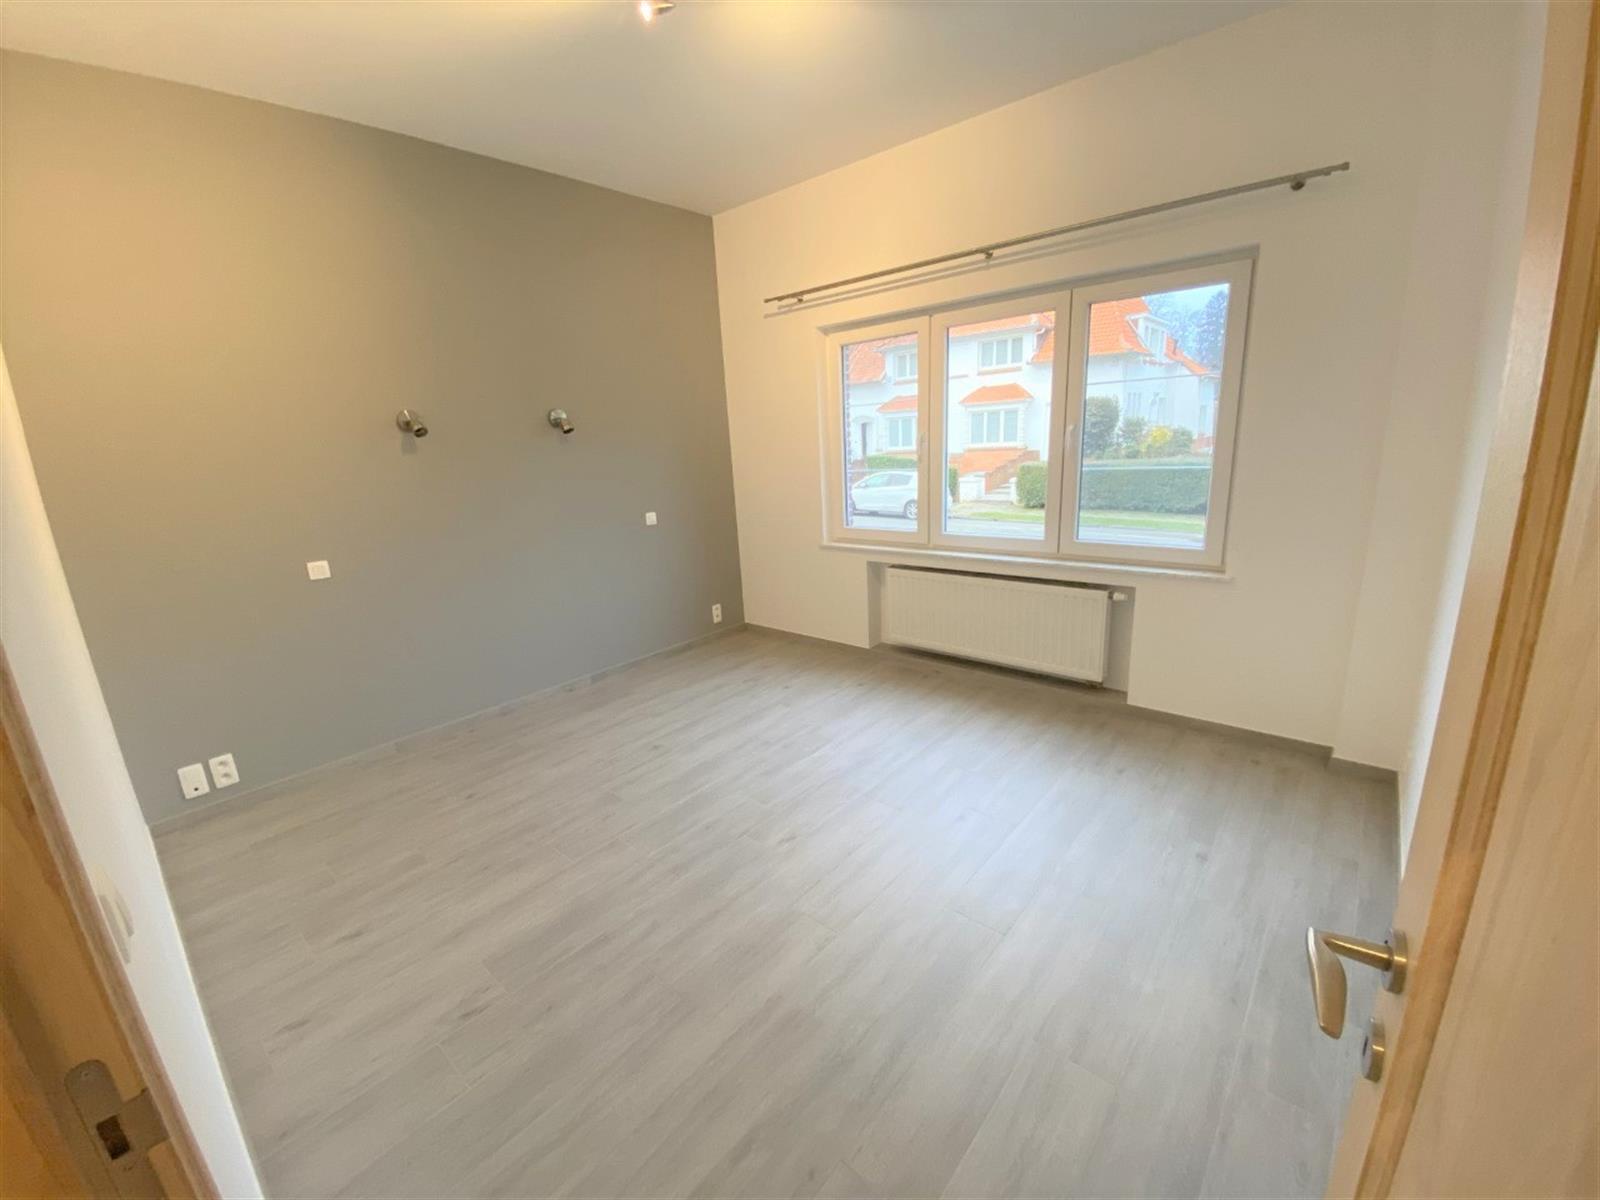 Gelijkvloerse verdieping - Uccle - #4241175-12